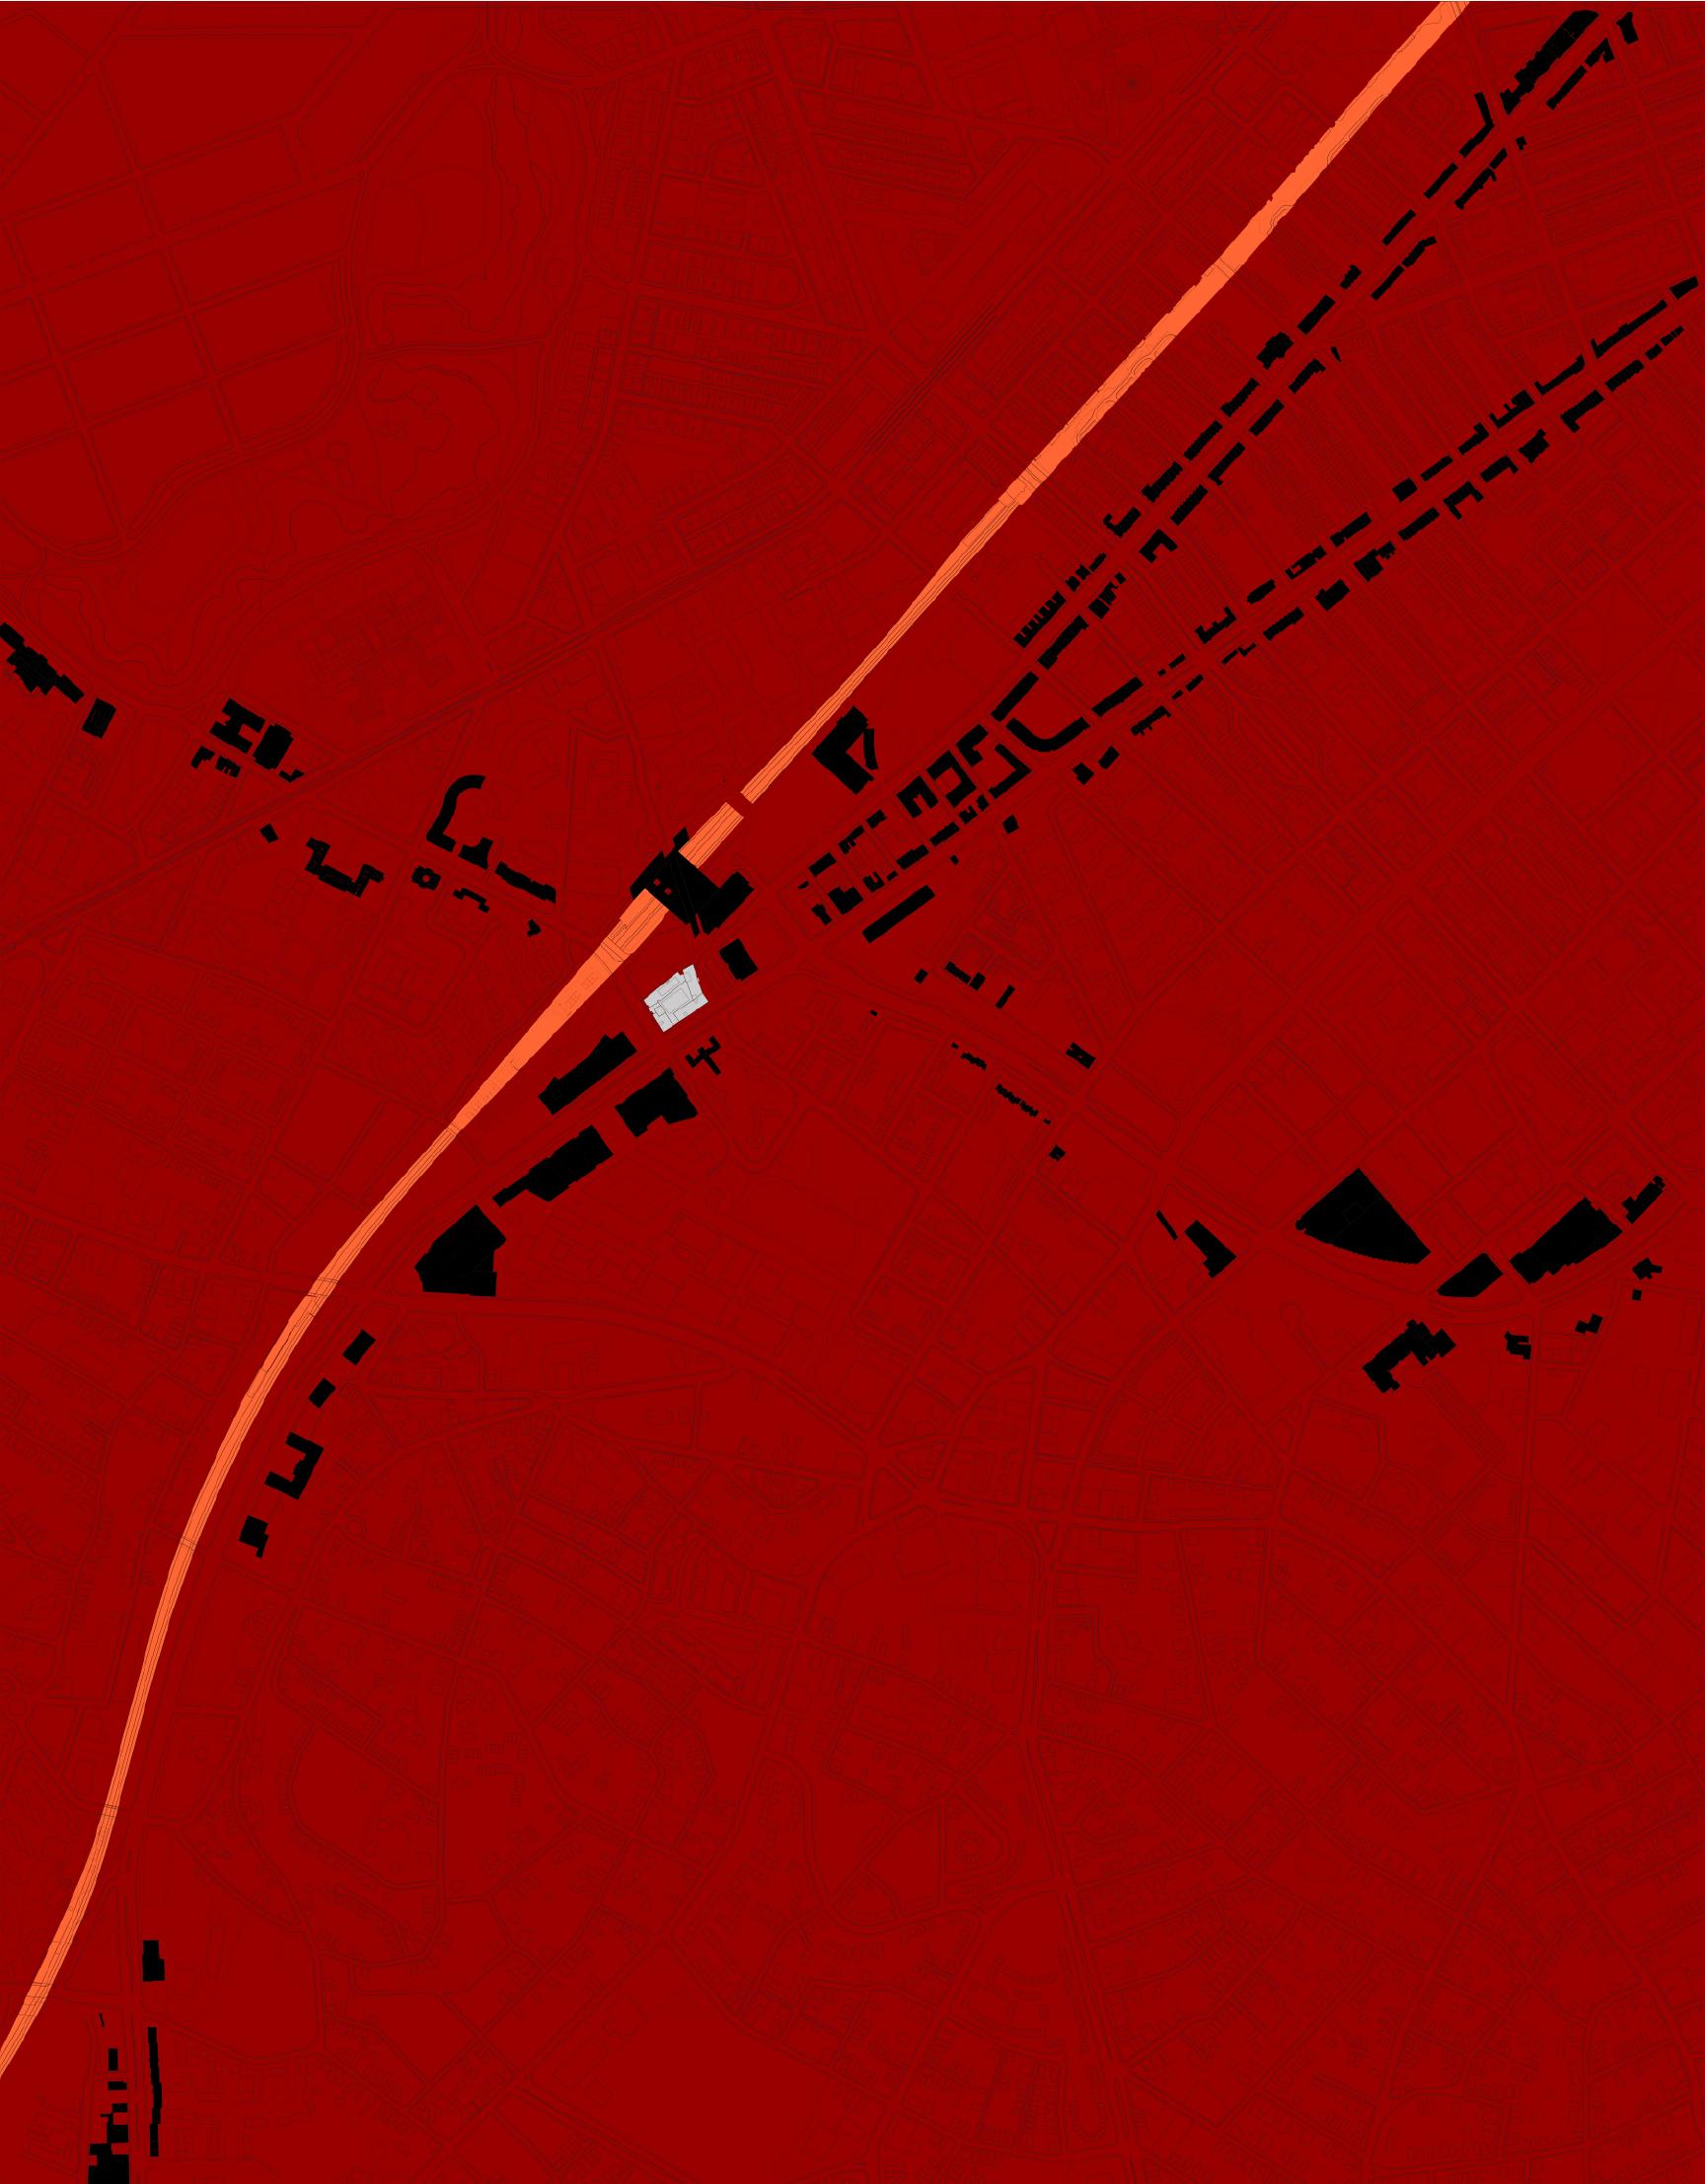 Northeastern_map_boston_transport 250_ps-01